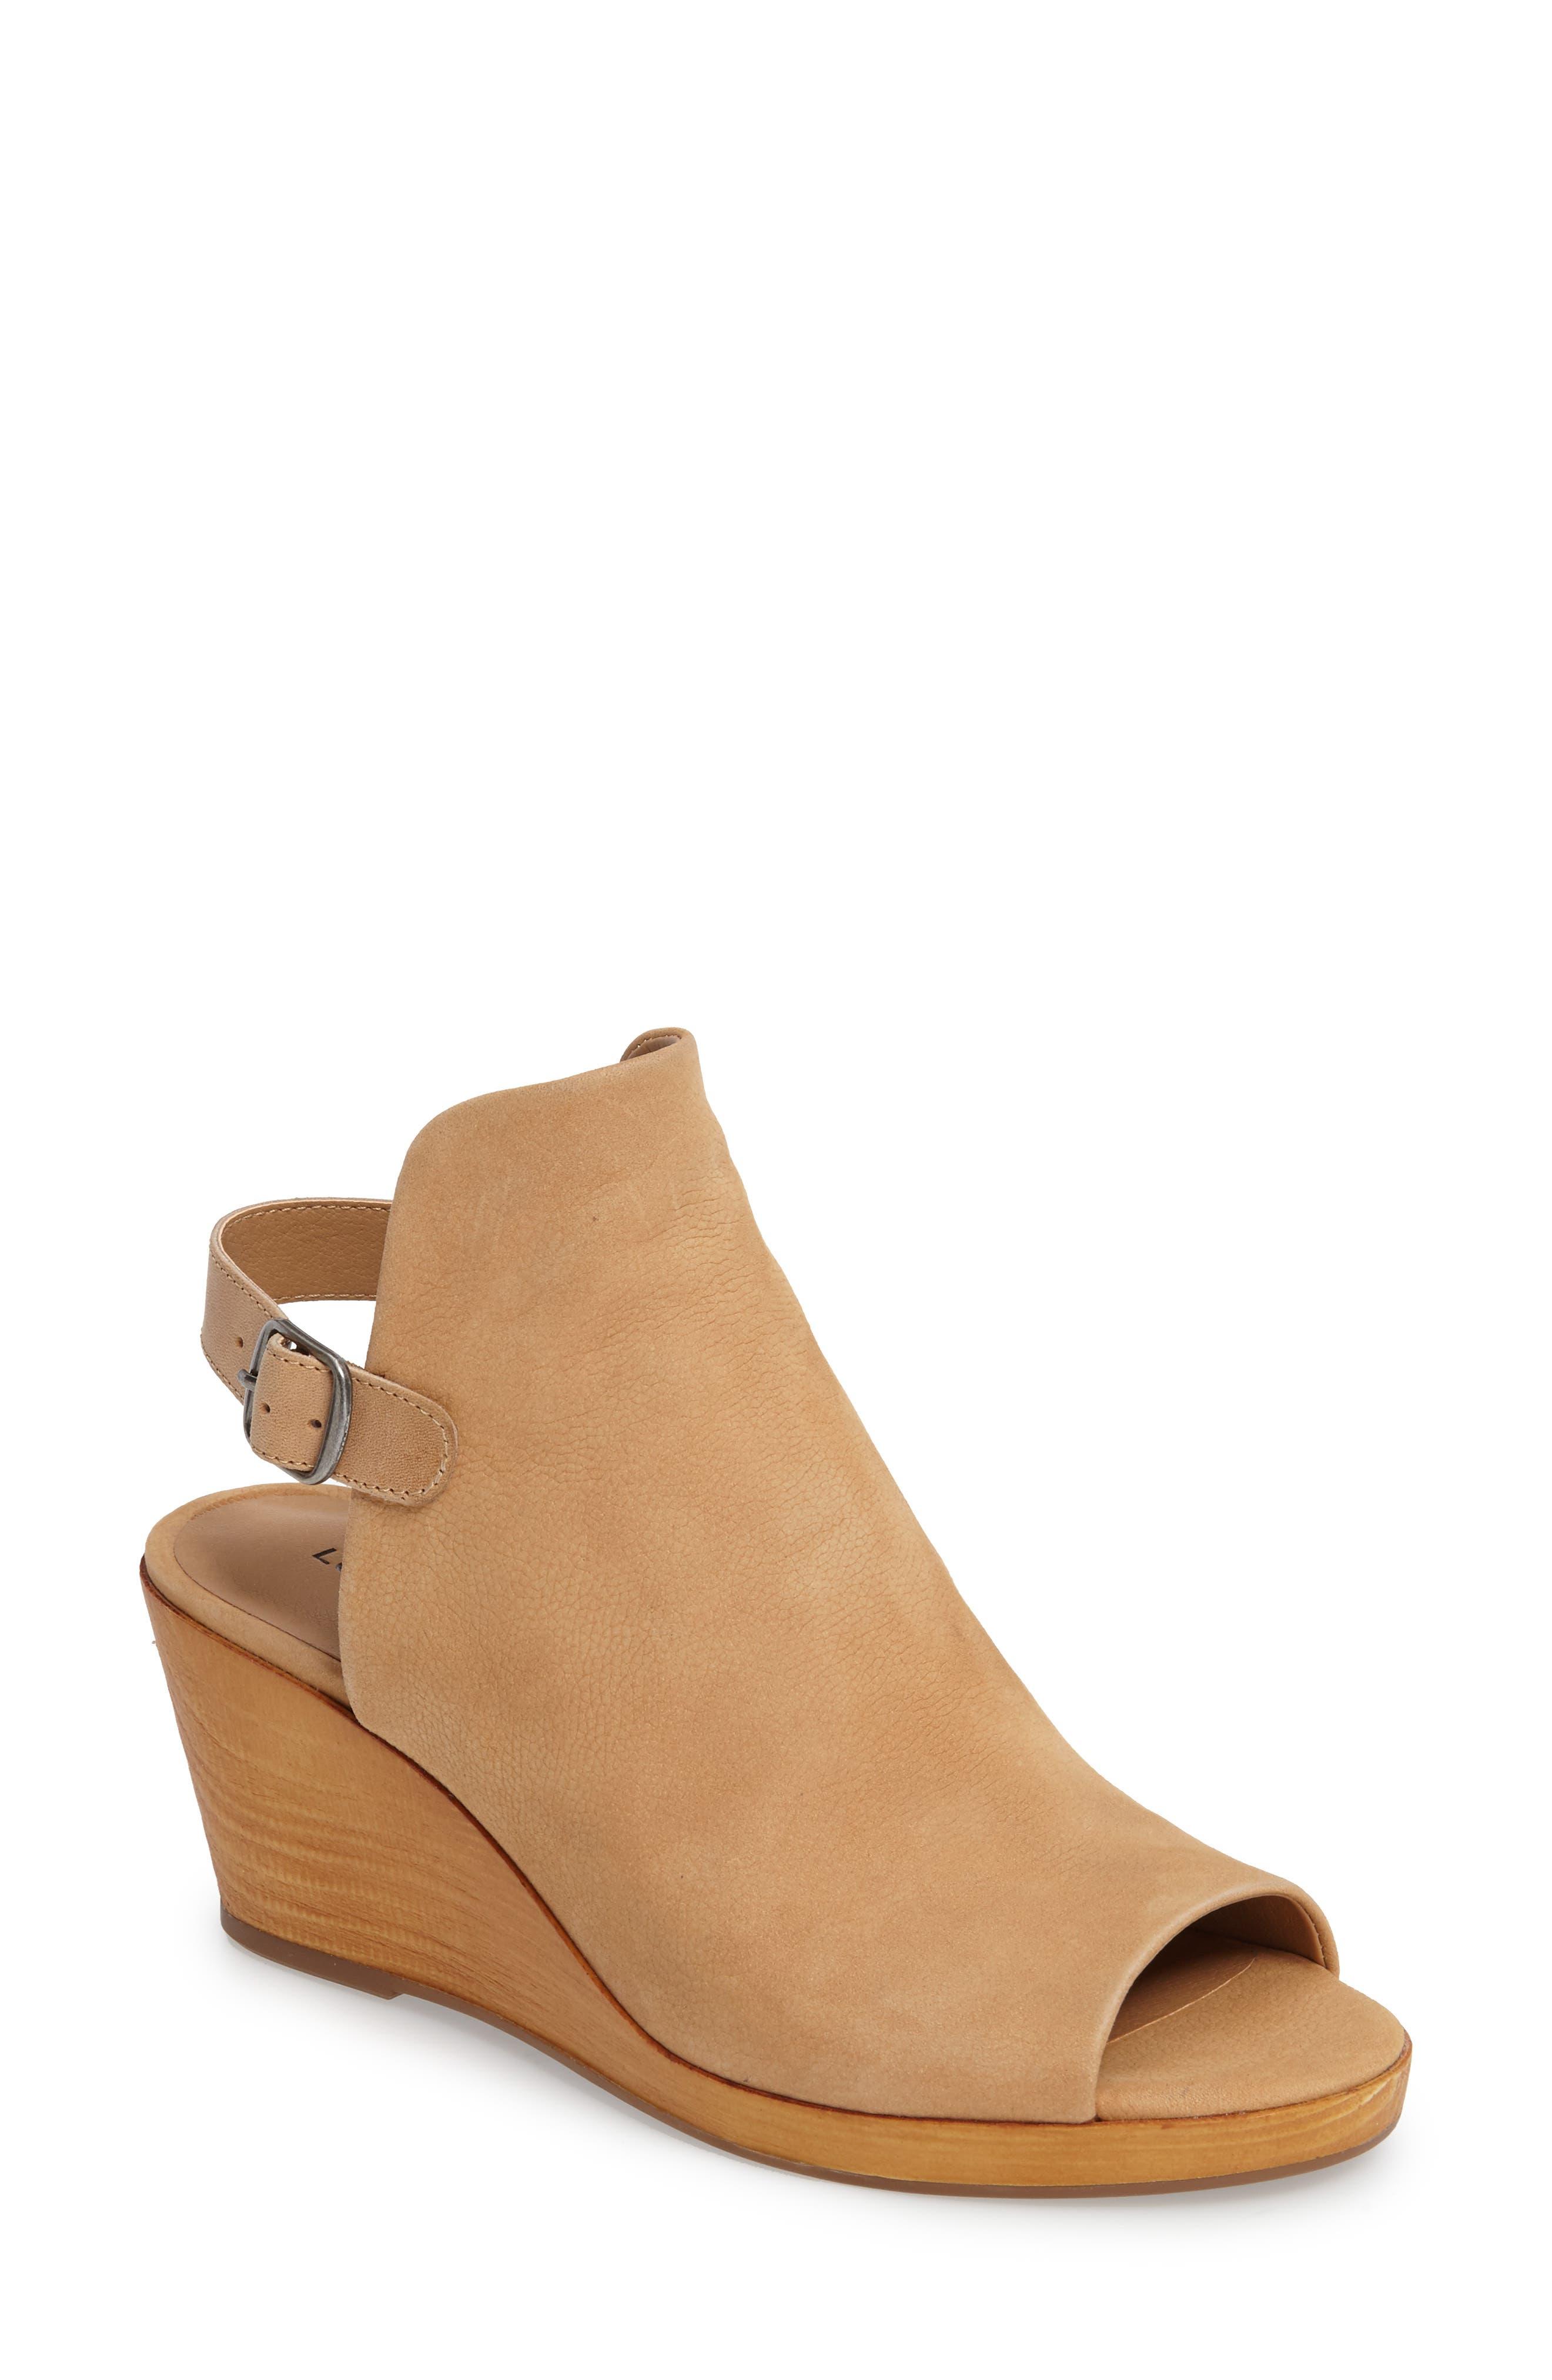 Main Image - Lucky Brand Keralin Wedge Sandal (Women)